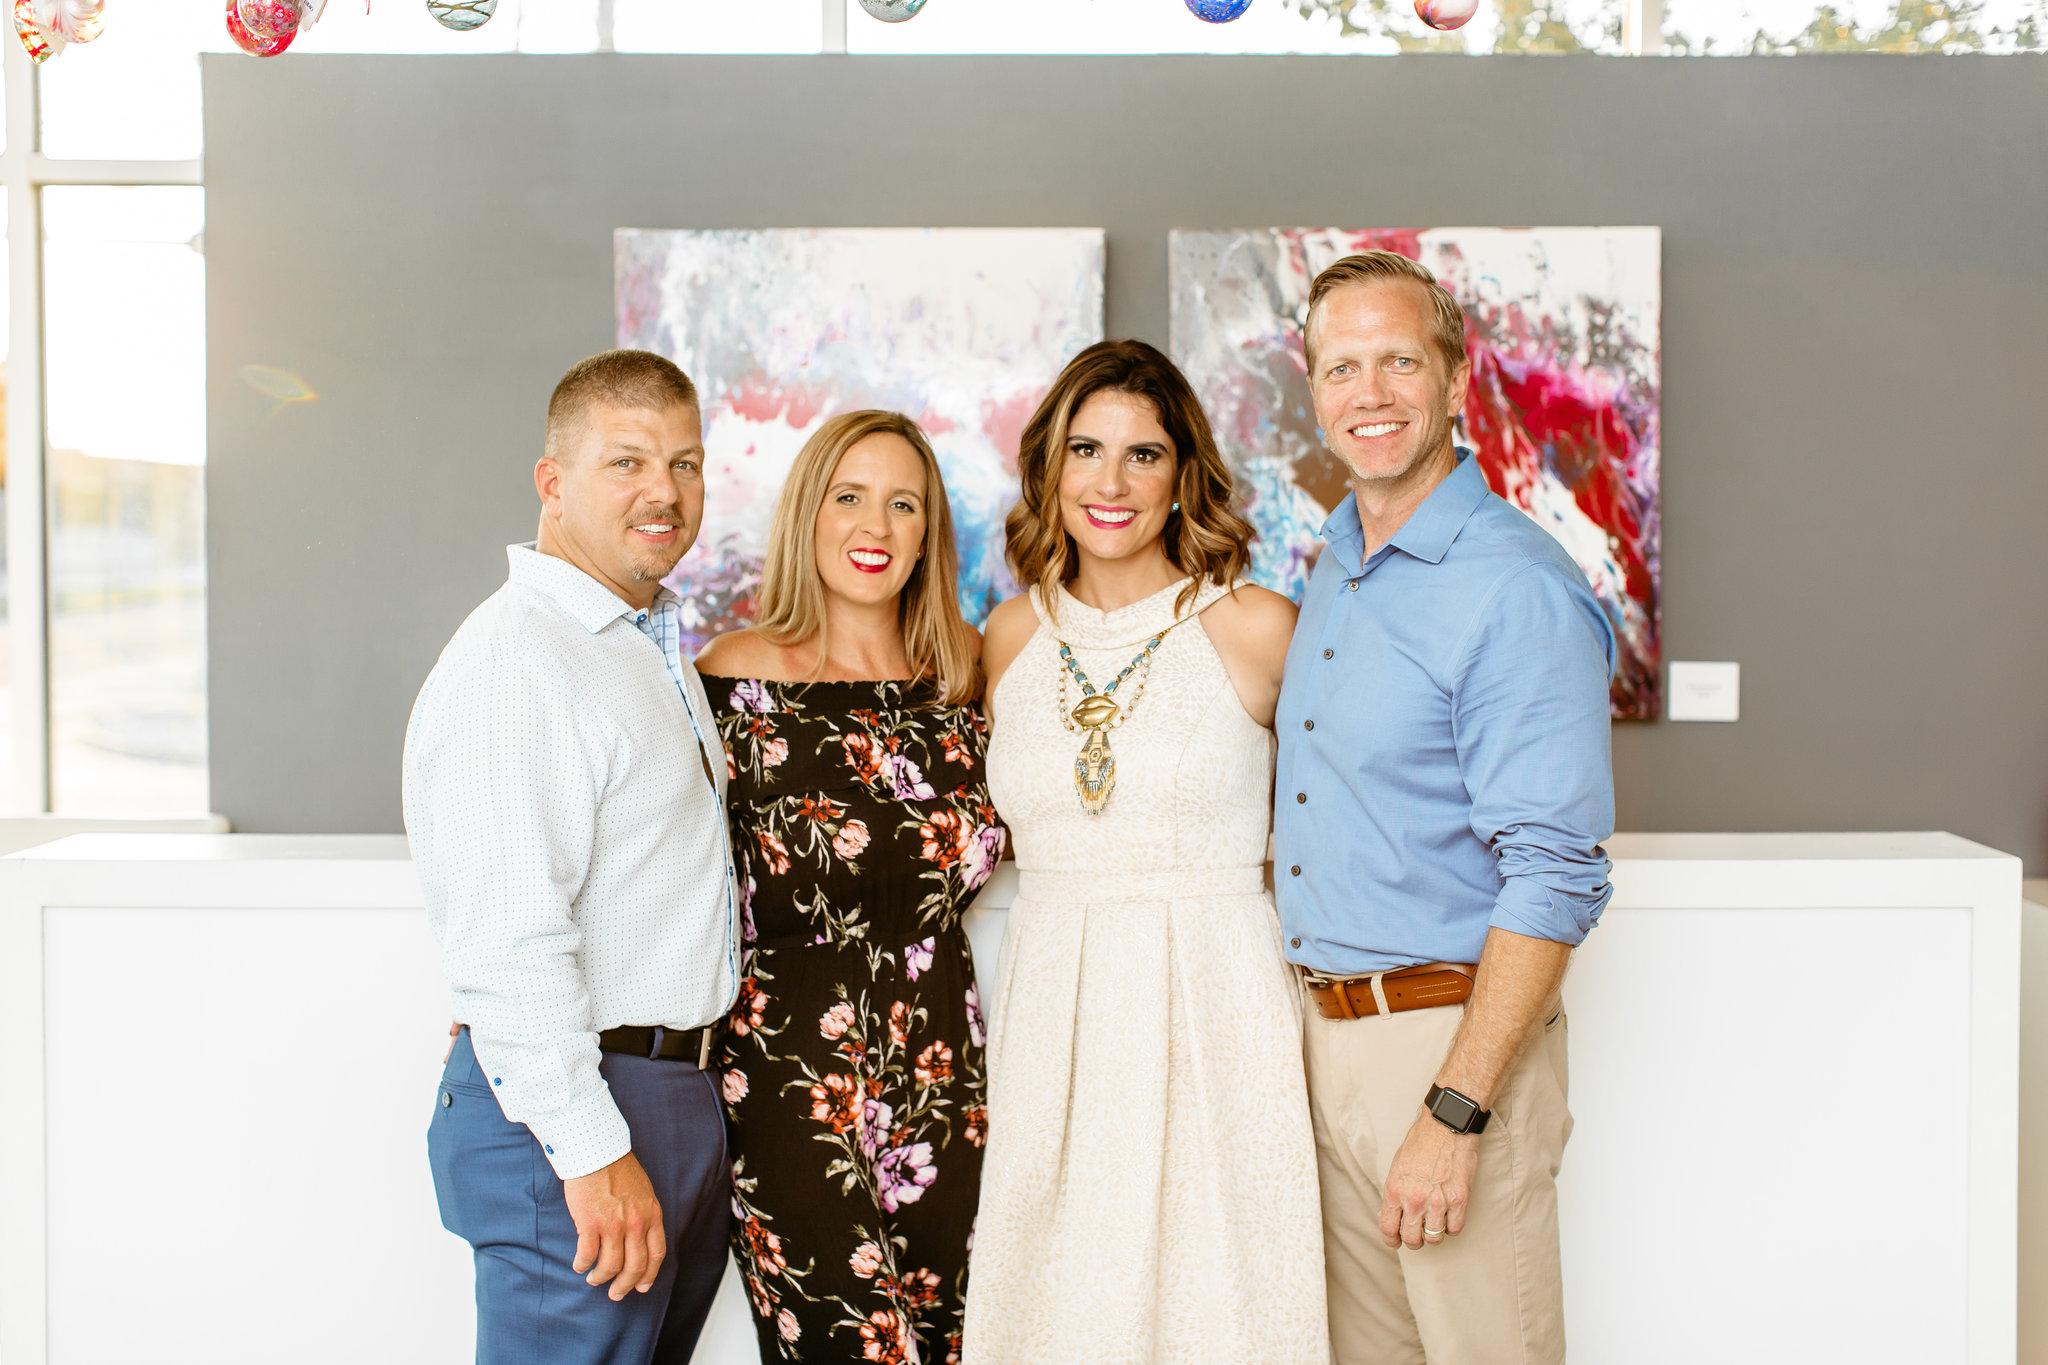 Alexa-Vossler-Photo_Dallas-Event-Photographer_Brite-Bar-Beauty-2018-Lipstick-Launch-Party-35.jpg